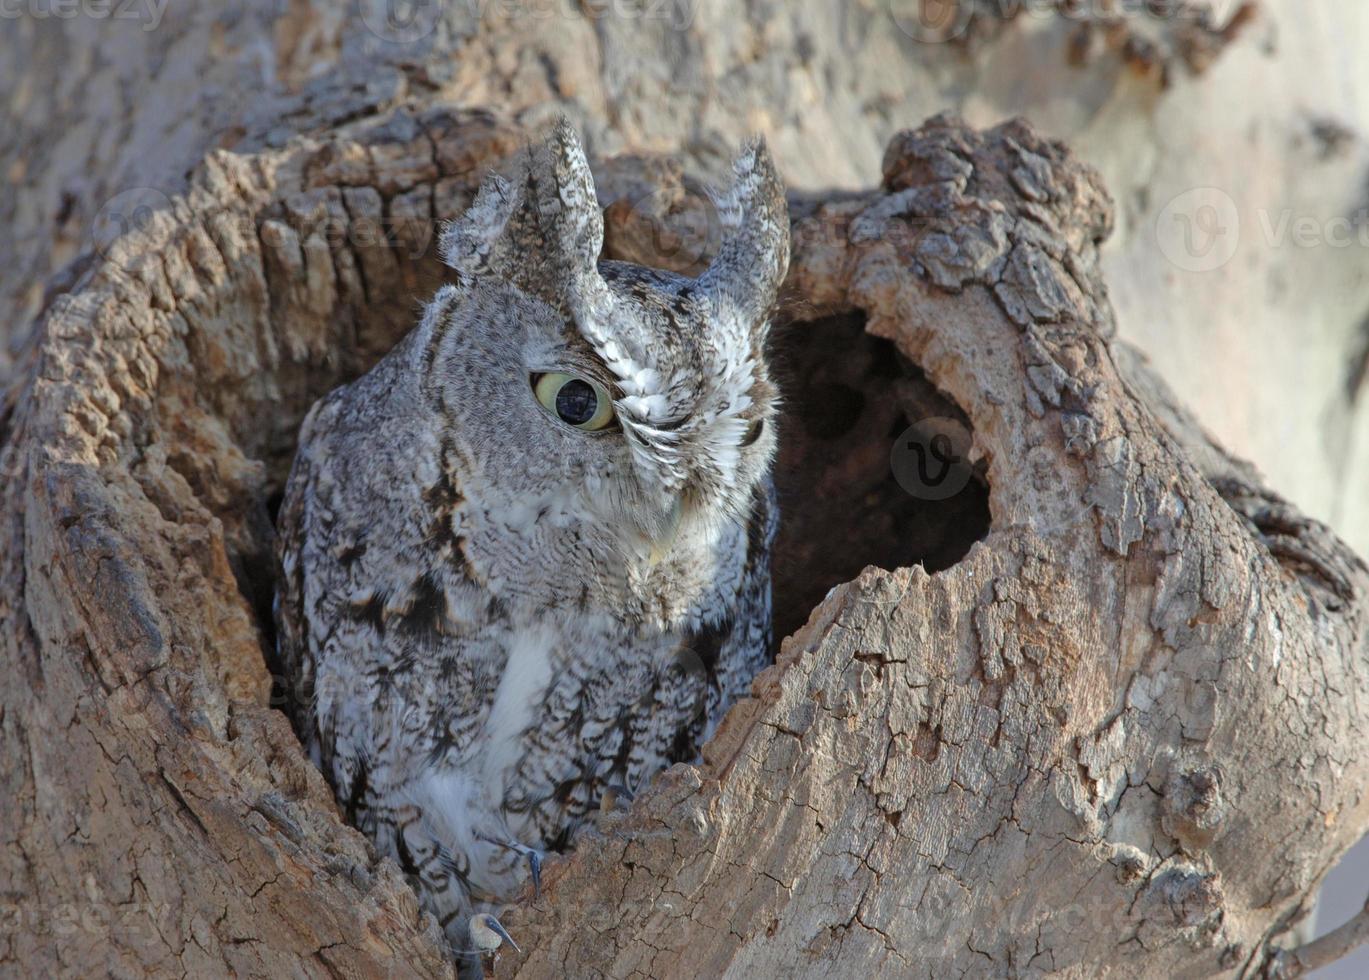 Screech Owl, fase gris, Nueva York, EE.UU. foto